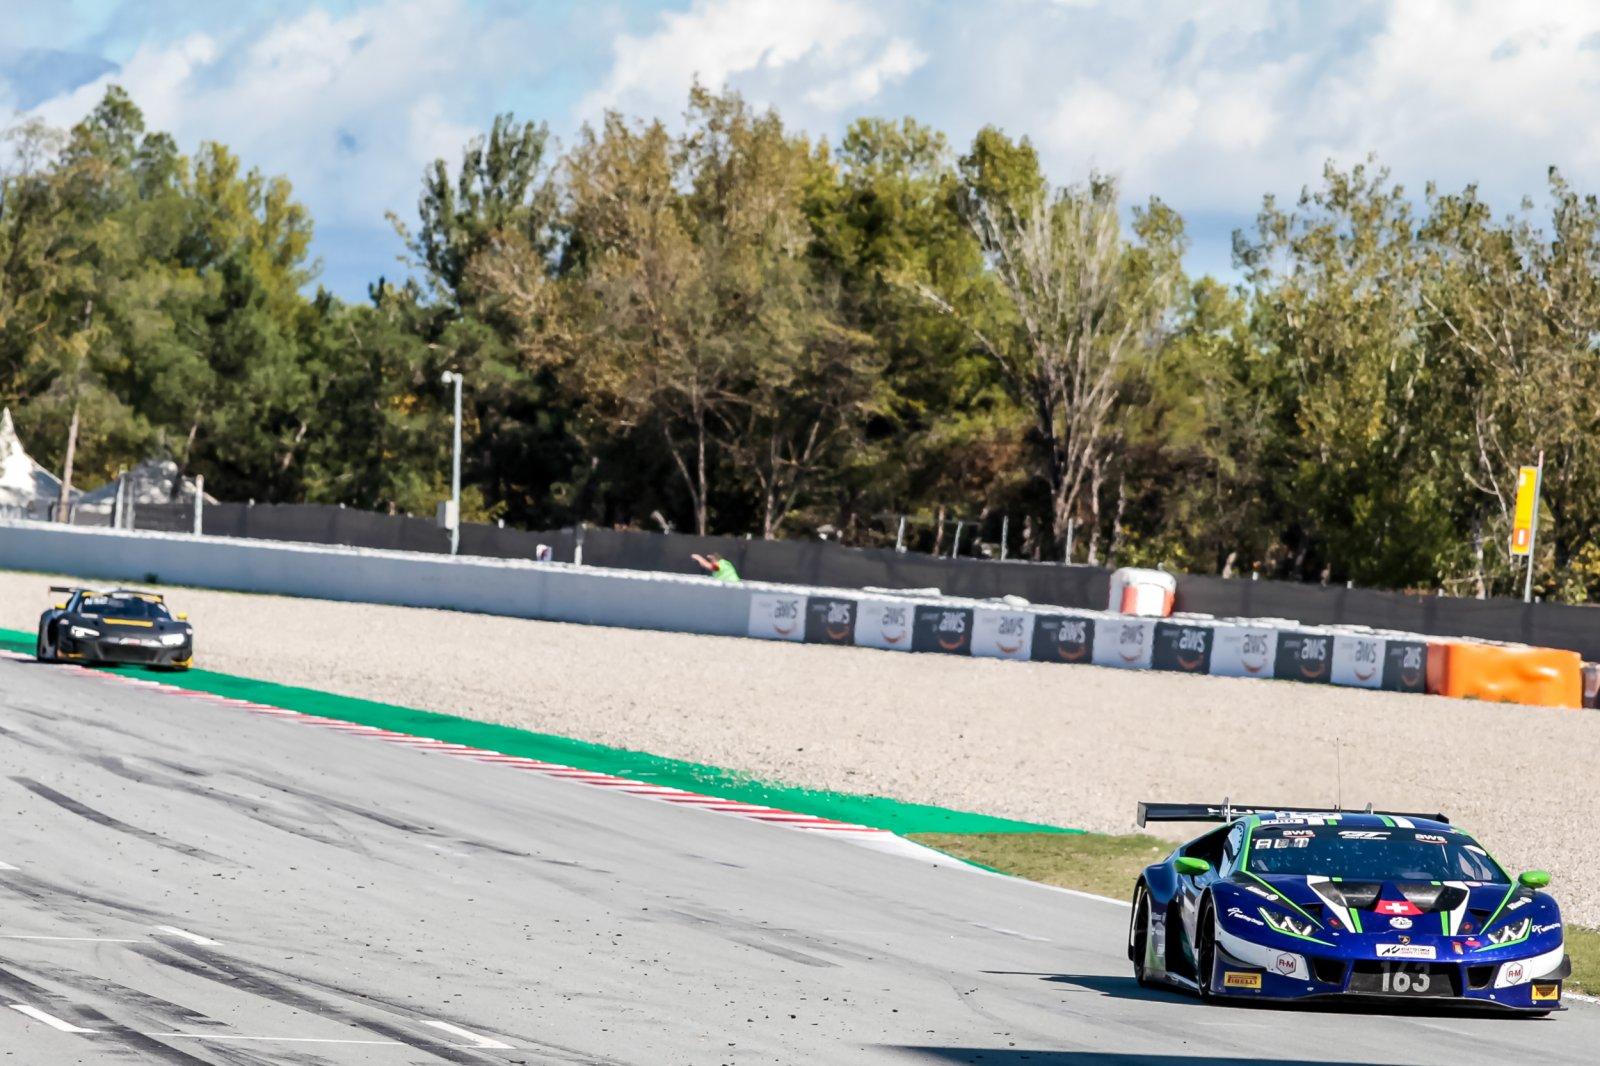 #163 Emil Frey Racing and #4 HRT Mercedes-AMG receive Barcelona race 2 penalties